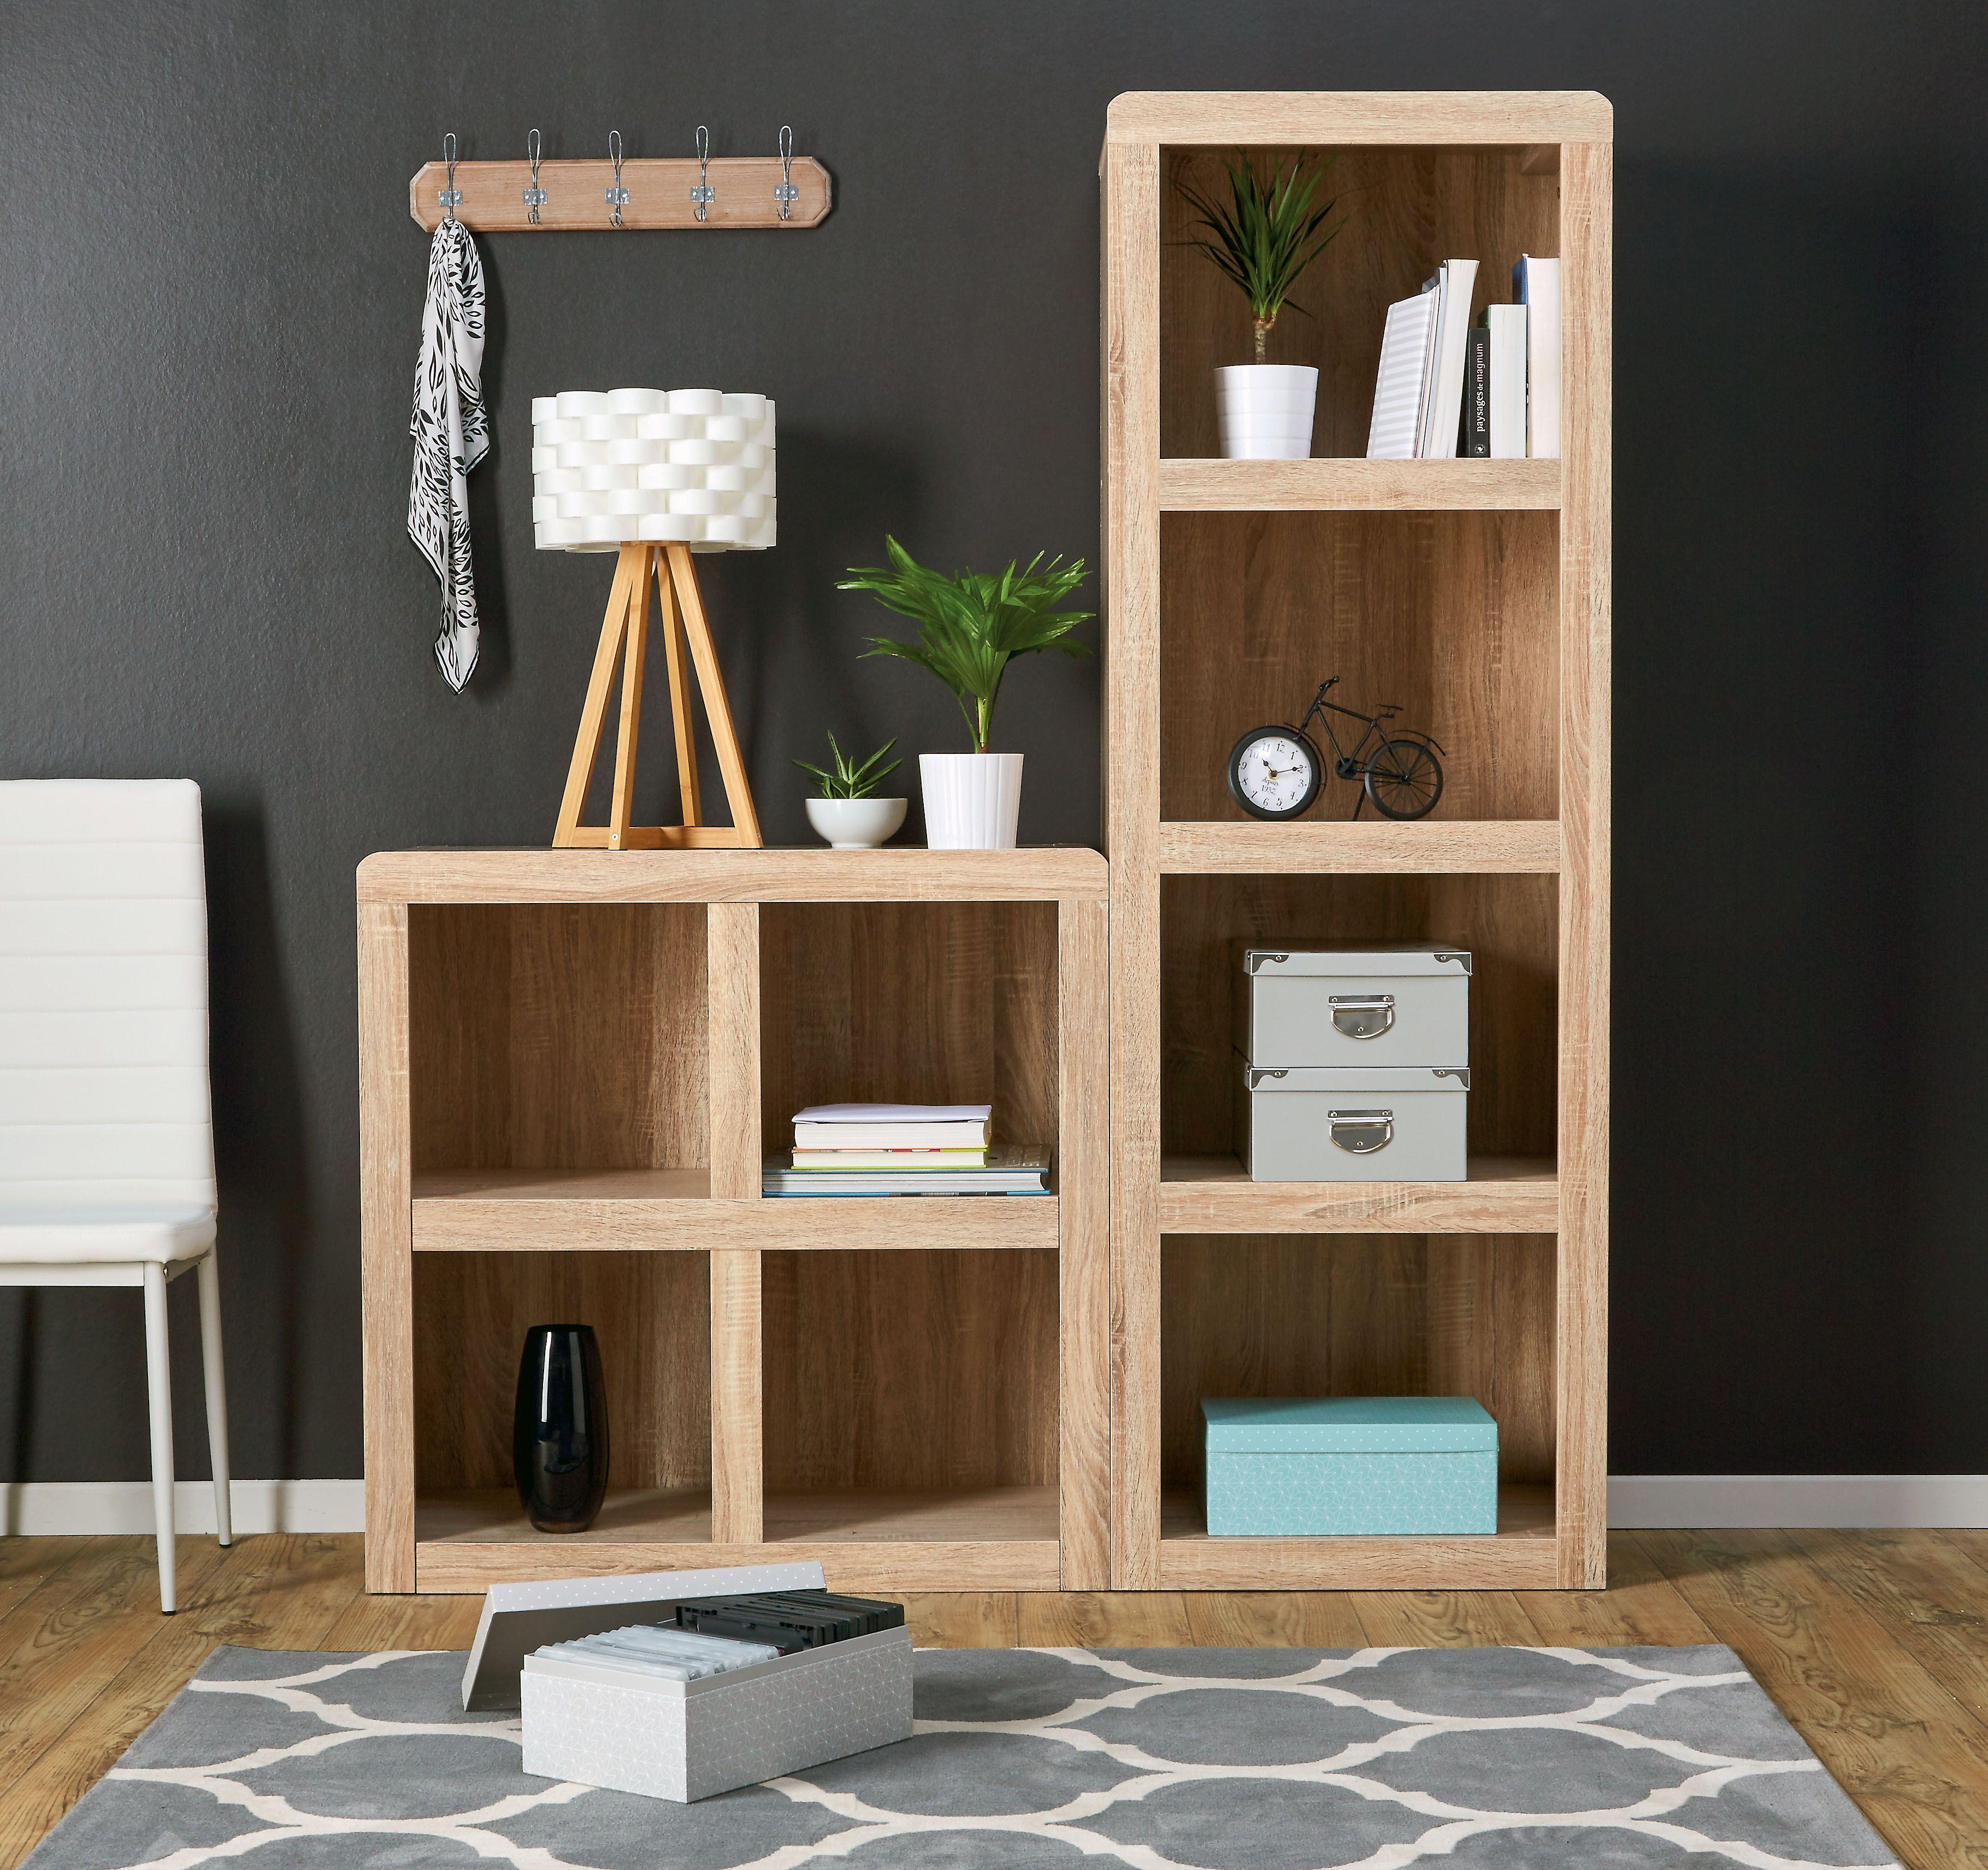 biblioth que colonne 4 niches en bois brut porte manteaux horloge poser v lo mes. Black Bedroom Furniture Sets. Home Design Ideas